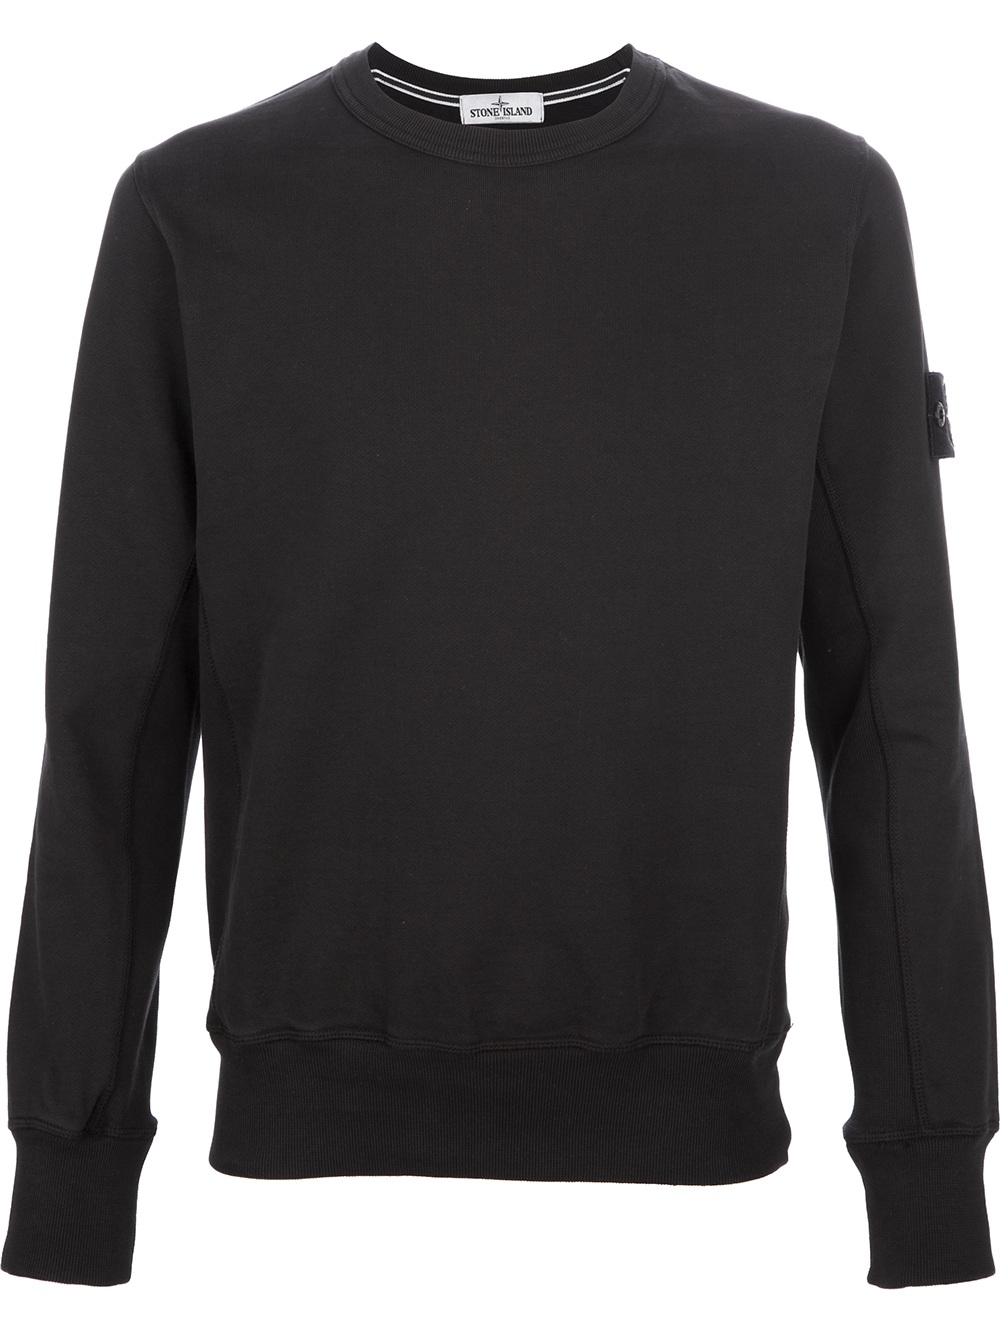 Lyst Stone Island Crew Neck Sweater In Black For Men